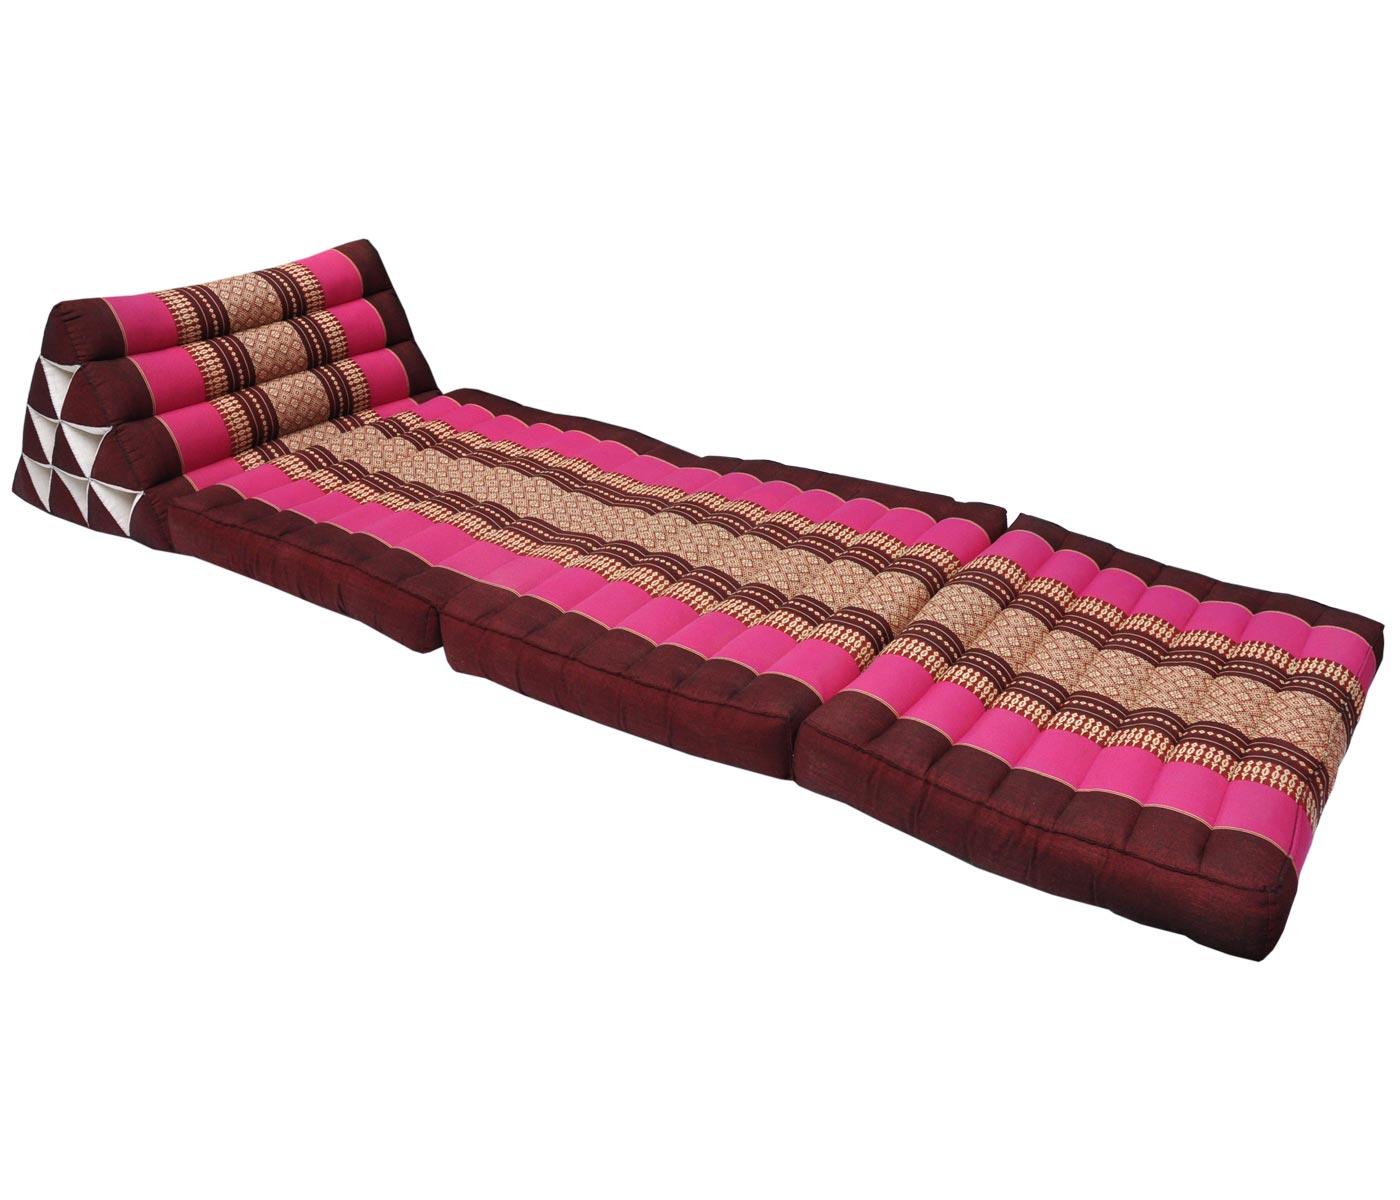 Cushions mattress pillow pad meditation bolster yoga